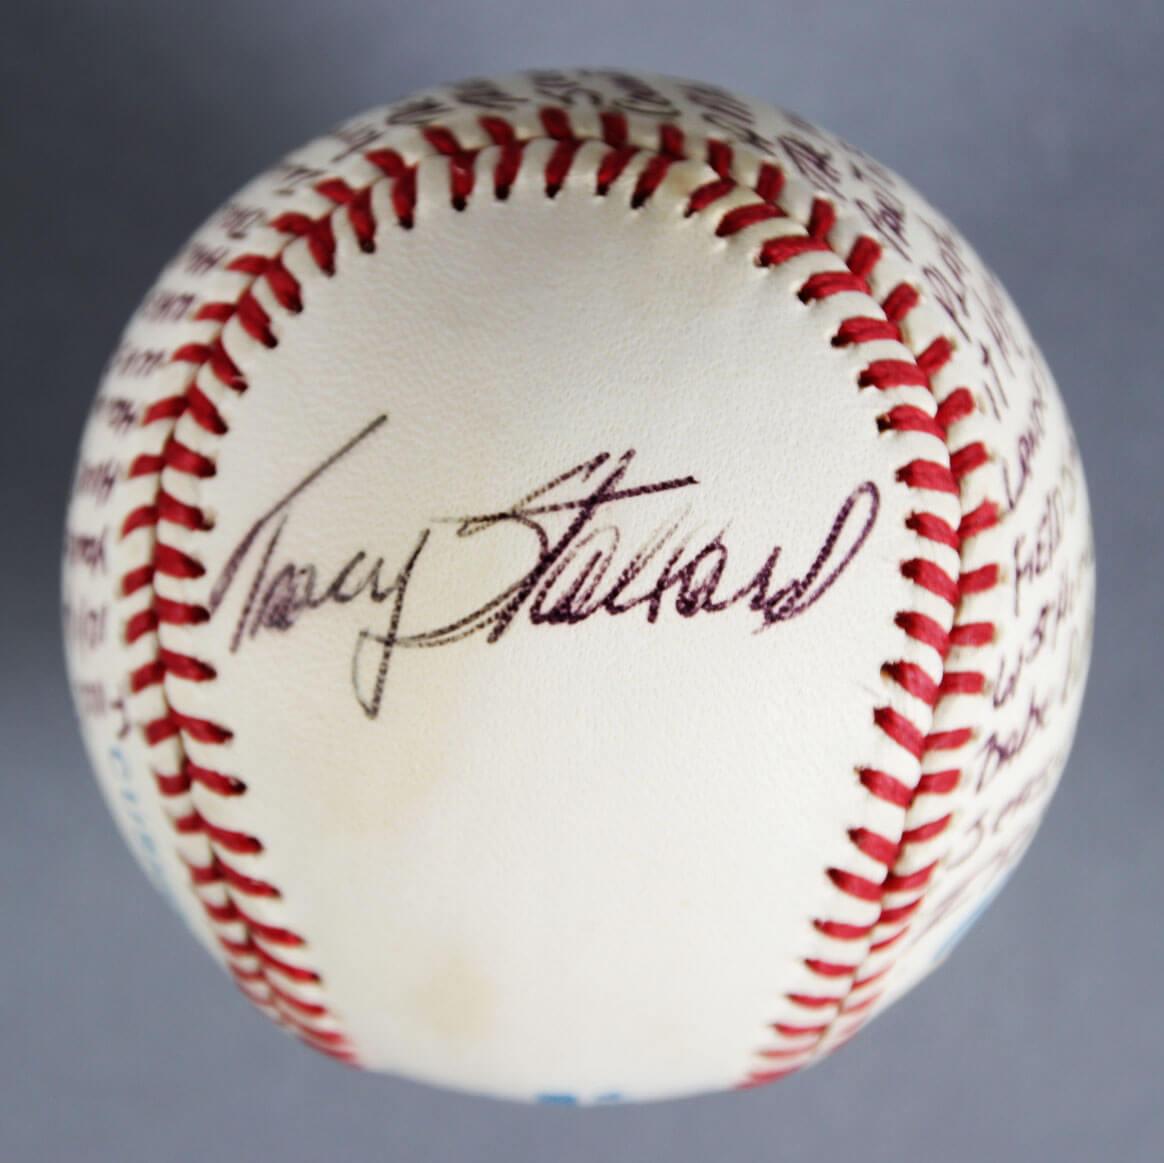 Tracy Stallard Signed Boston Red Sox Baseball - COA JSA